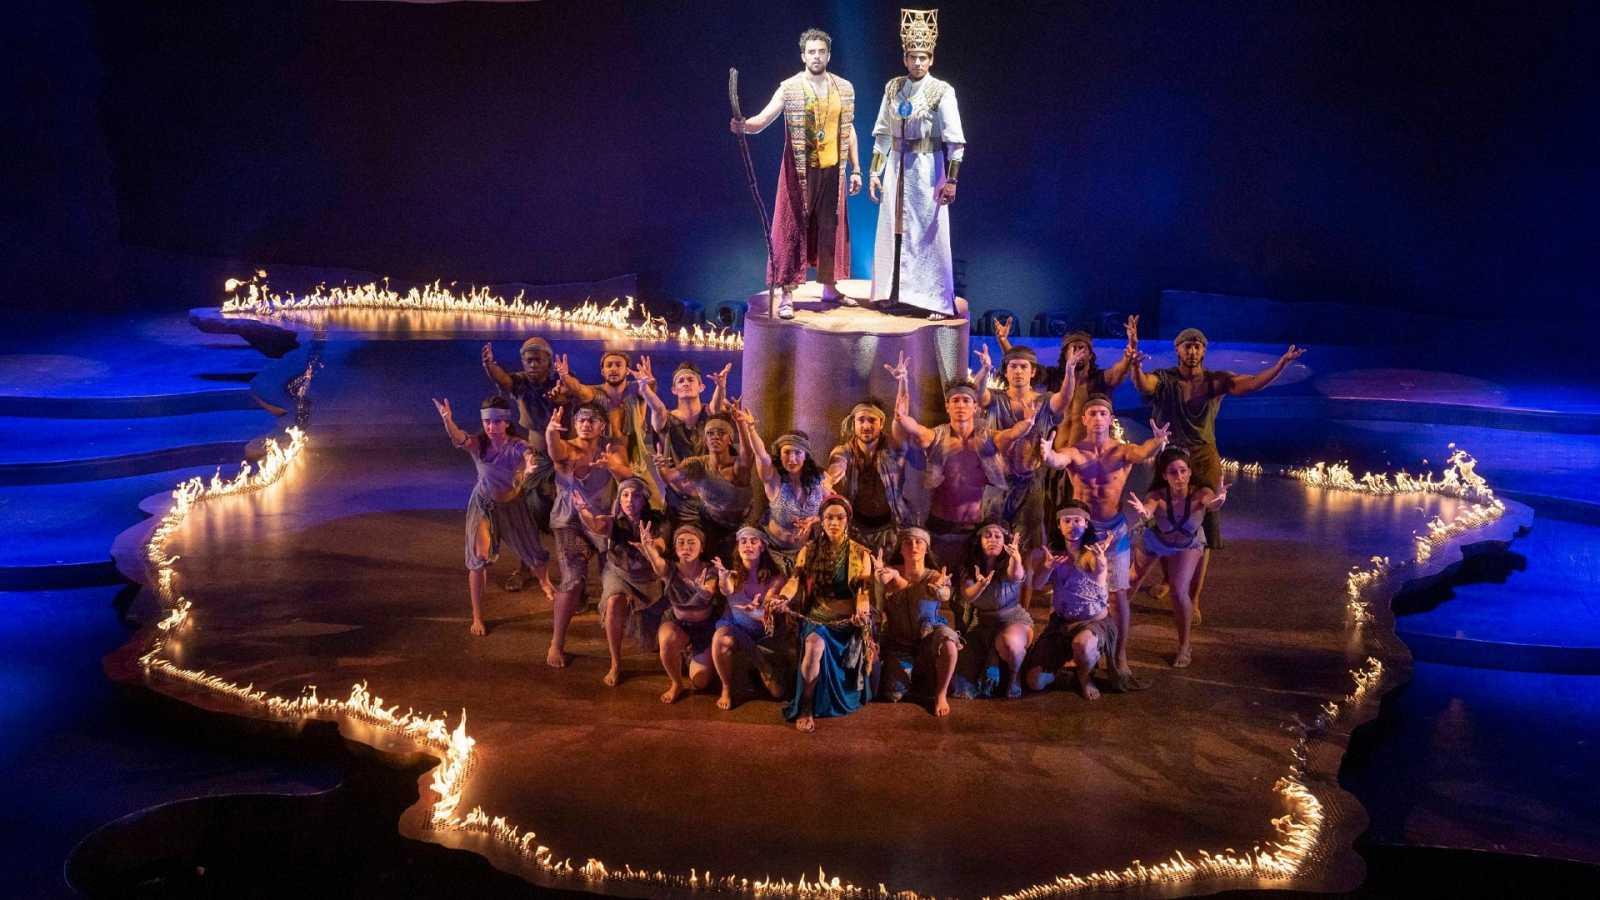 El musical - The prince of Egypt - 24/05/20 - Escuchar ahora